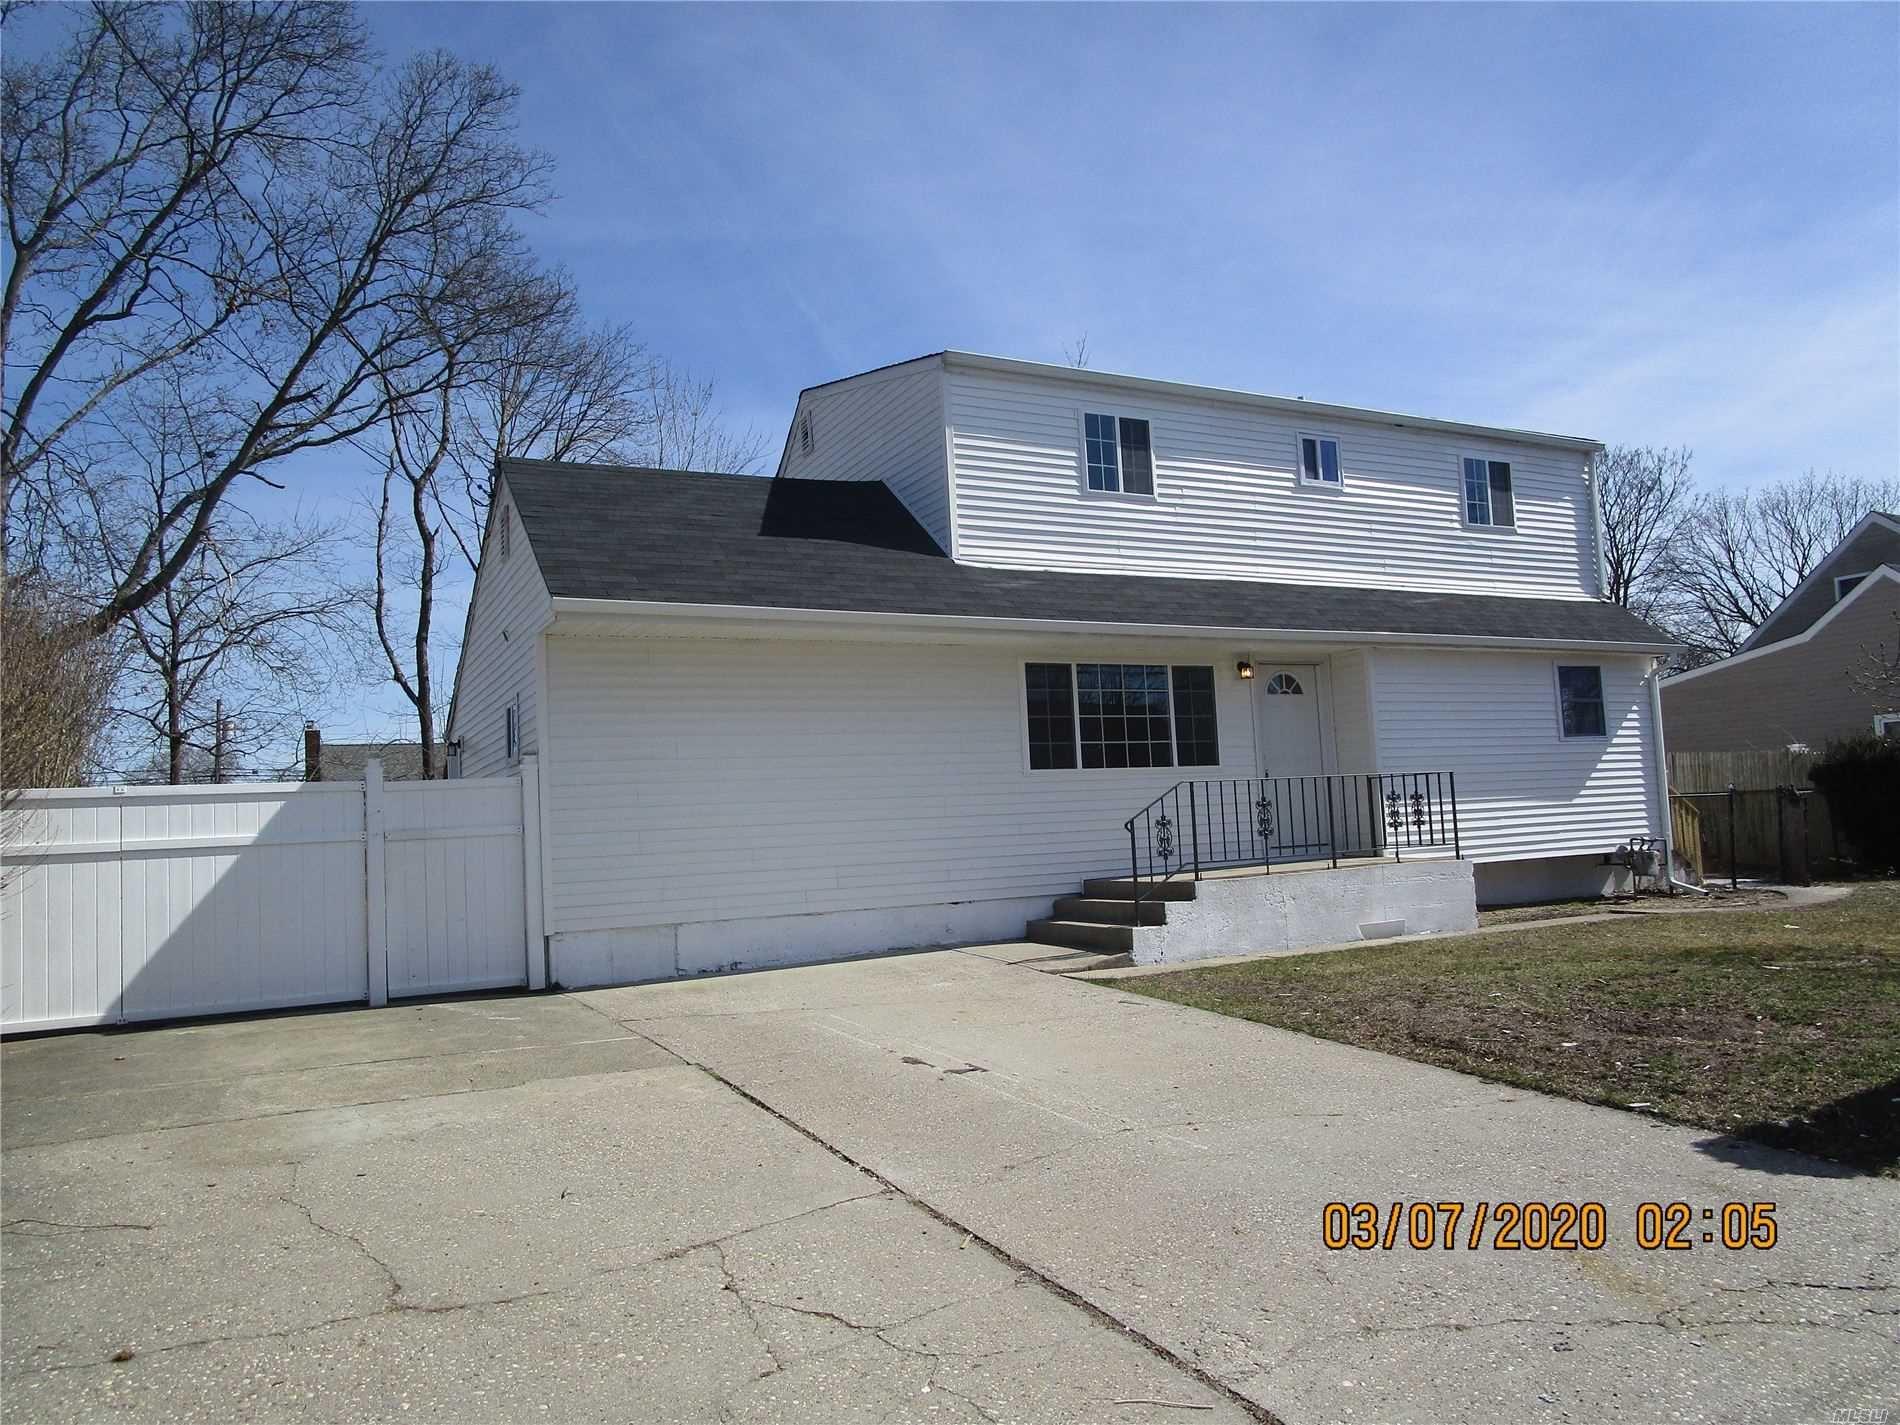 183 Charter Oaks Avenue, Brentwood, NY 11717 - MLS#: 3200230